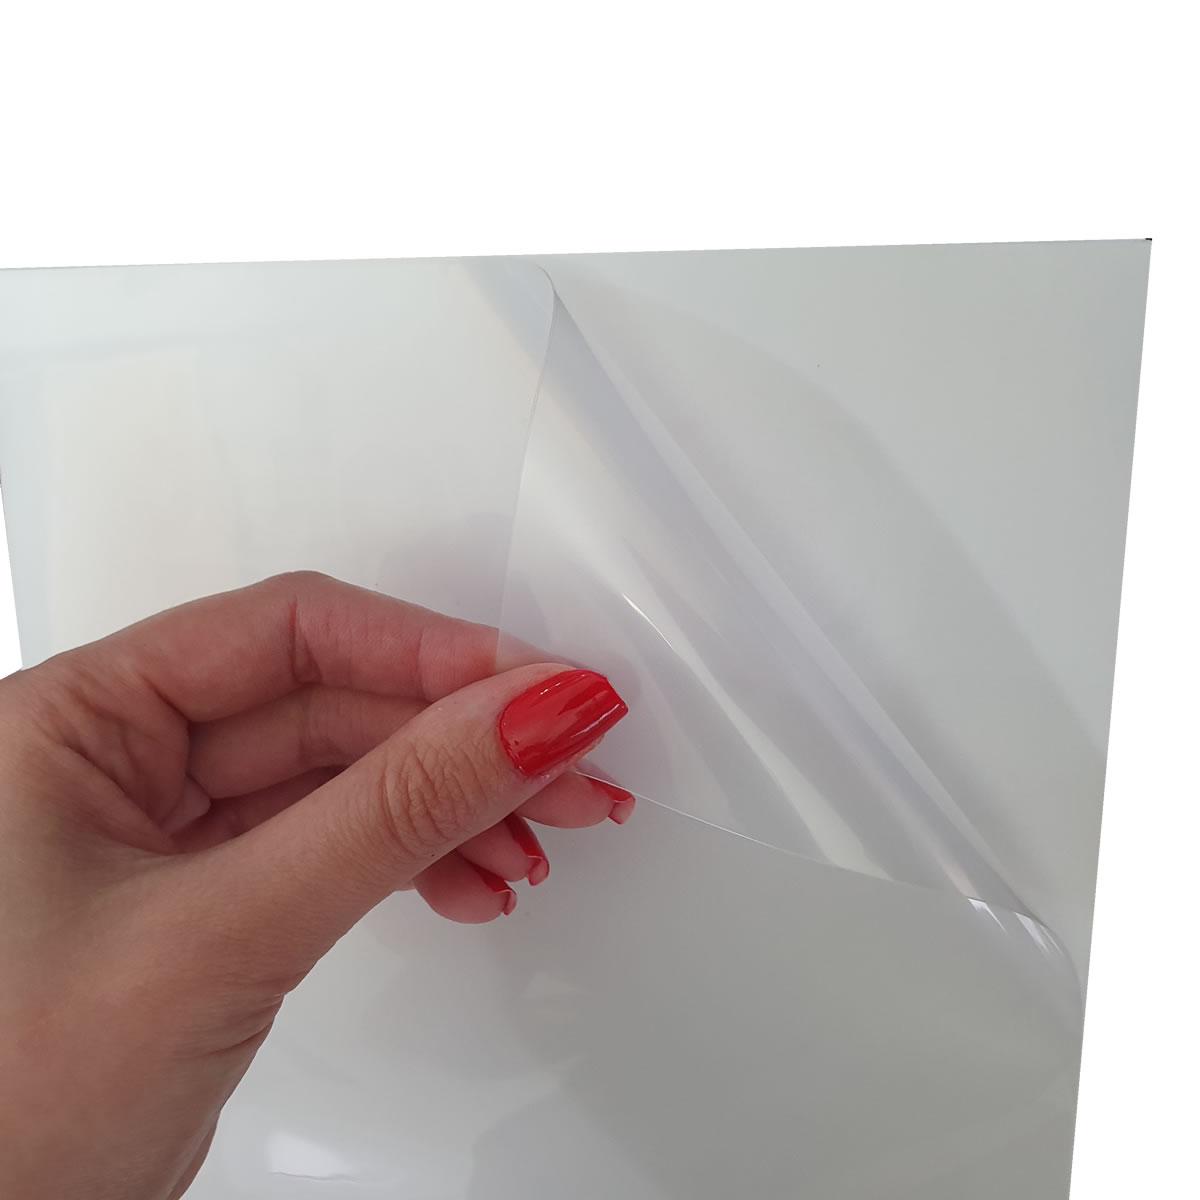 100 Adesivos Vinil Transparentes Impressoras Jato De Tinta A4